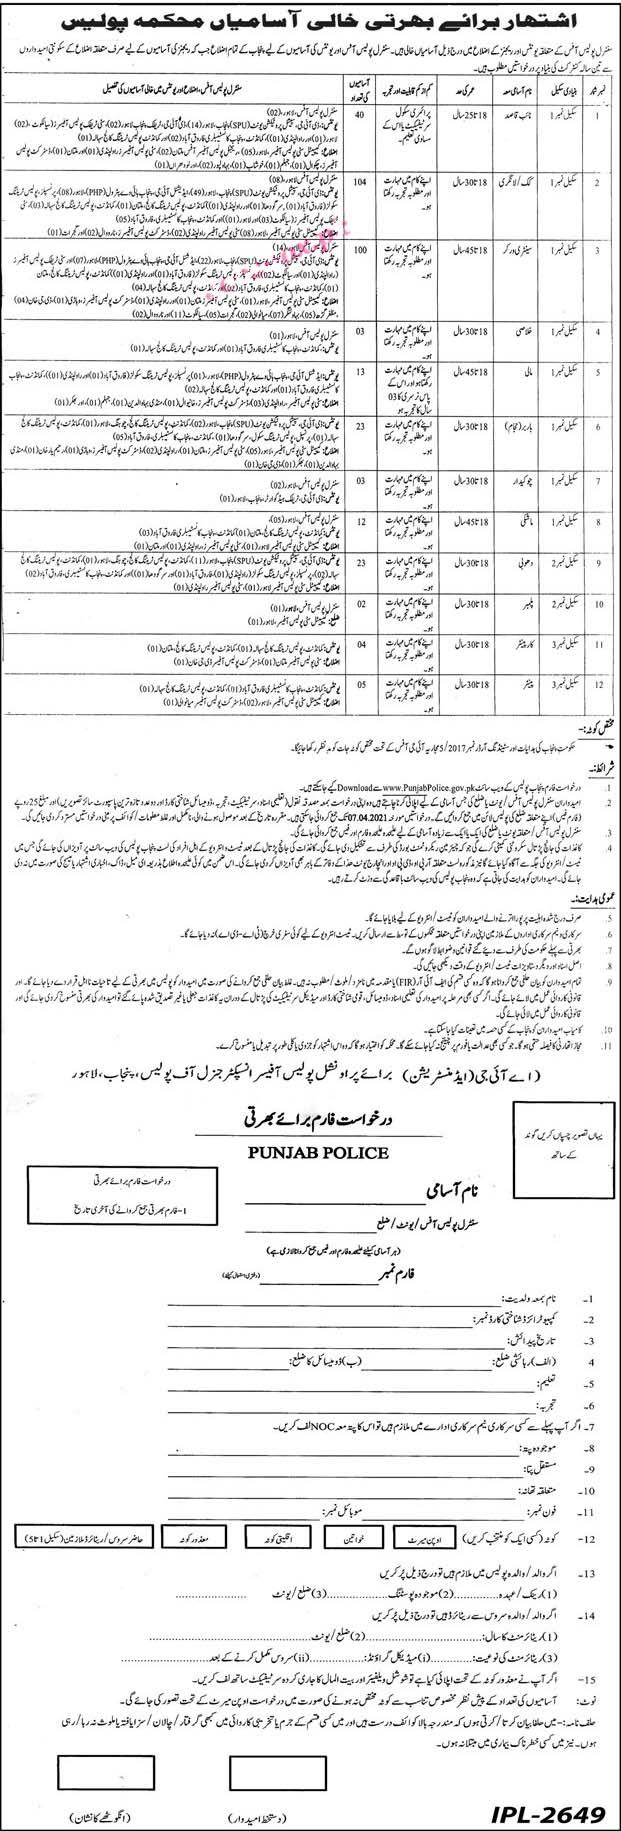 latest punjab police jobs 2021 advertisement